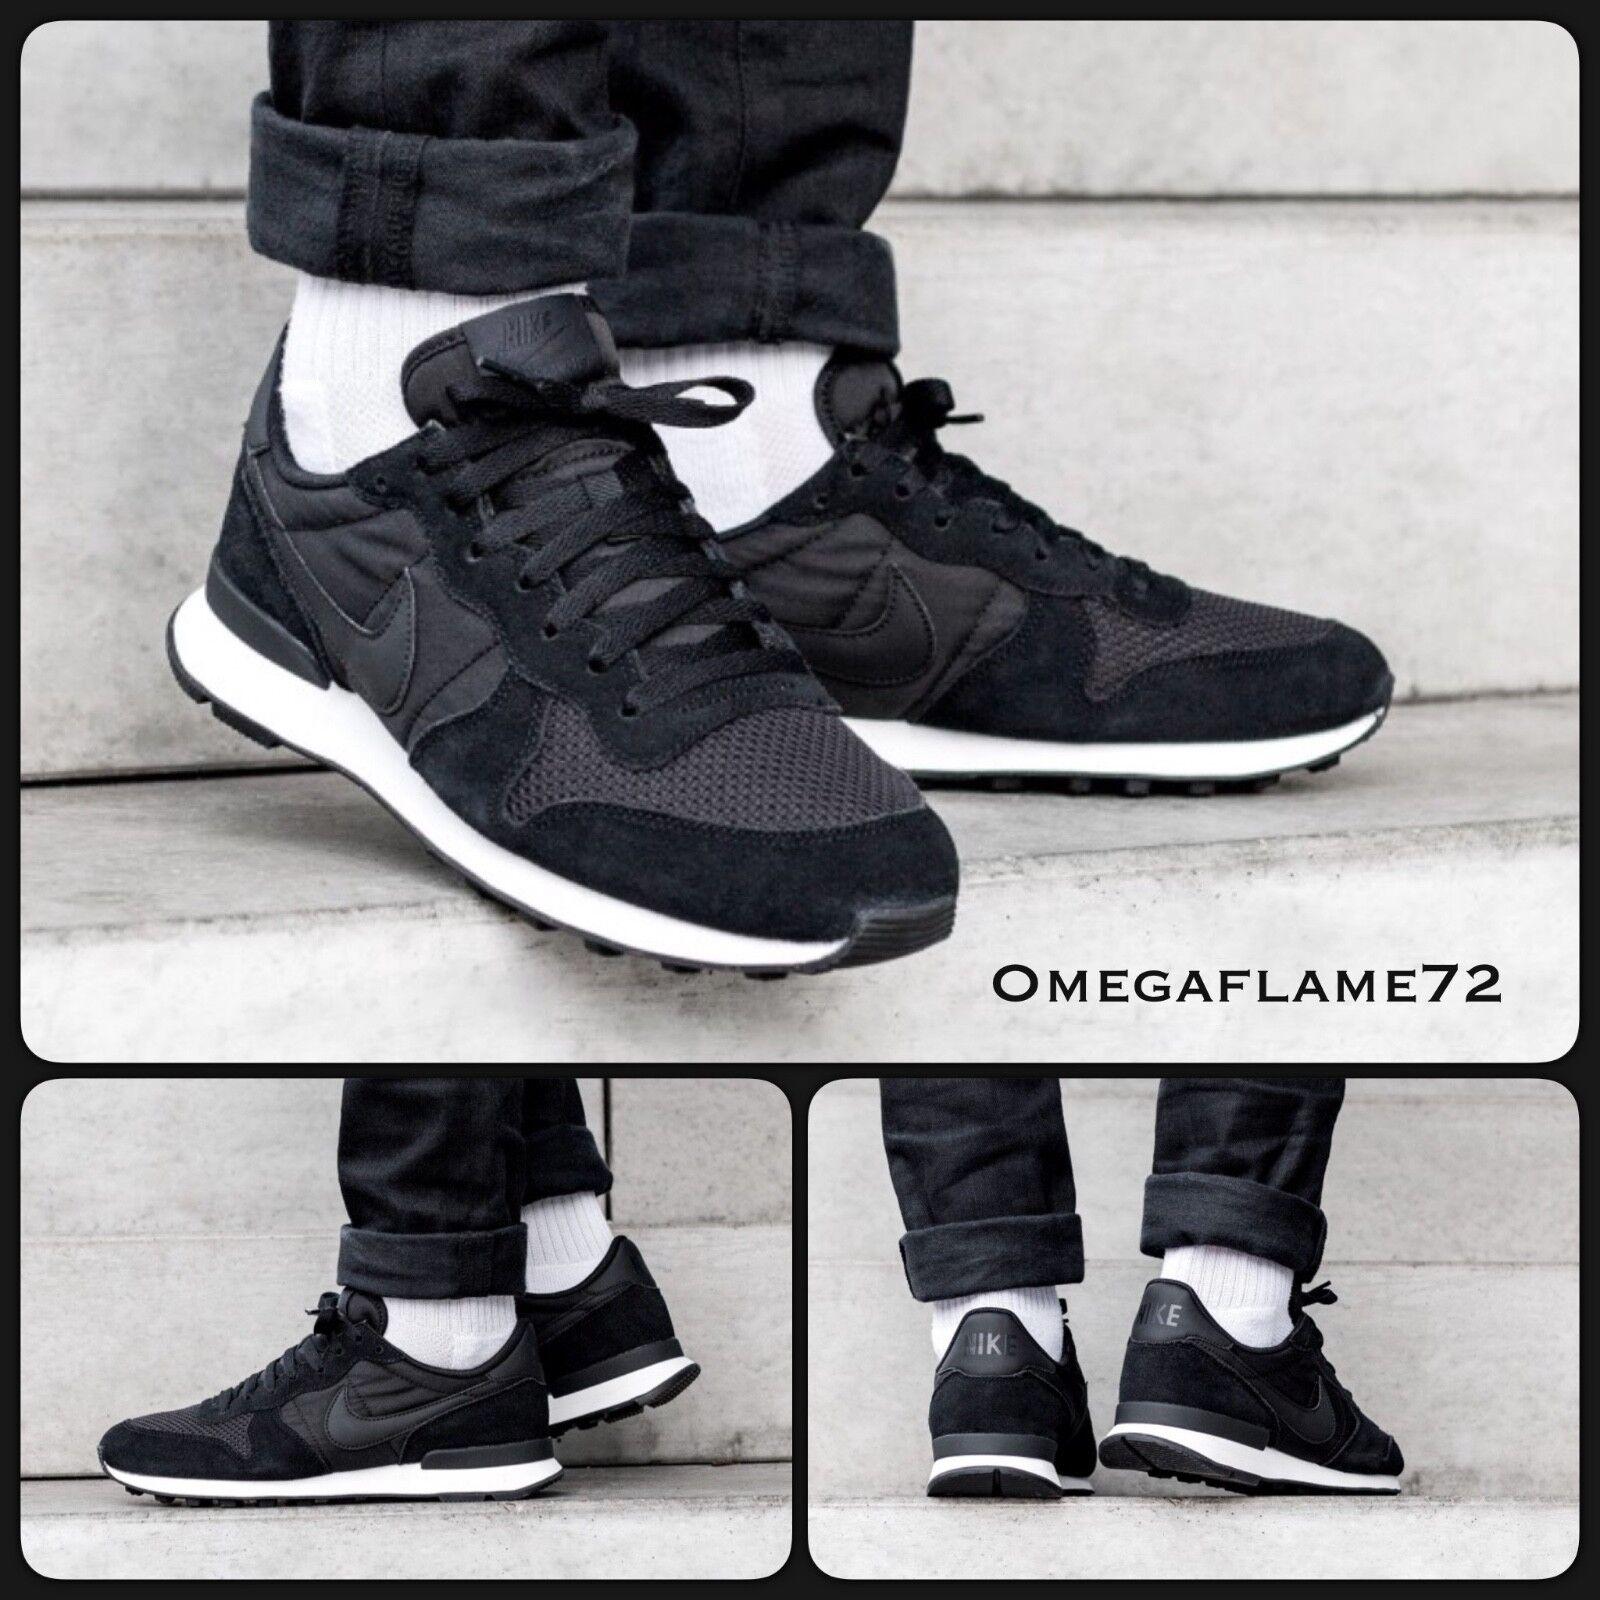 Nike internationalistischen se, 11, aj2024-002, aj2024-002, 11, schwarz & segel 2bc07a